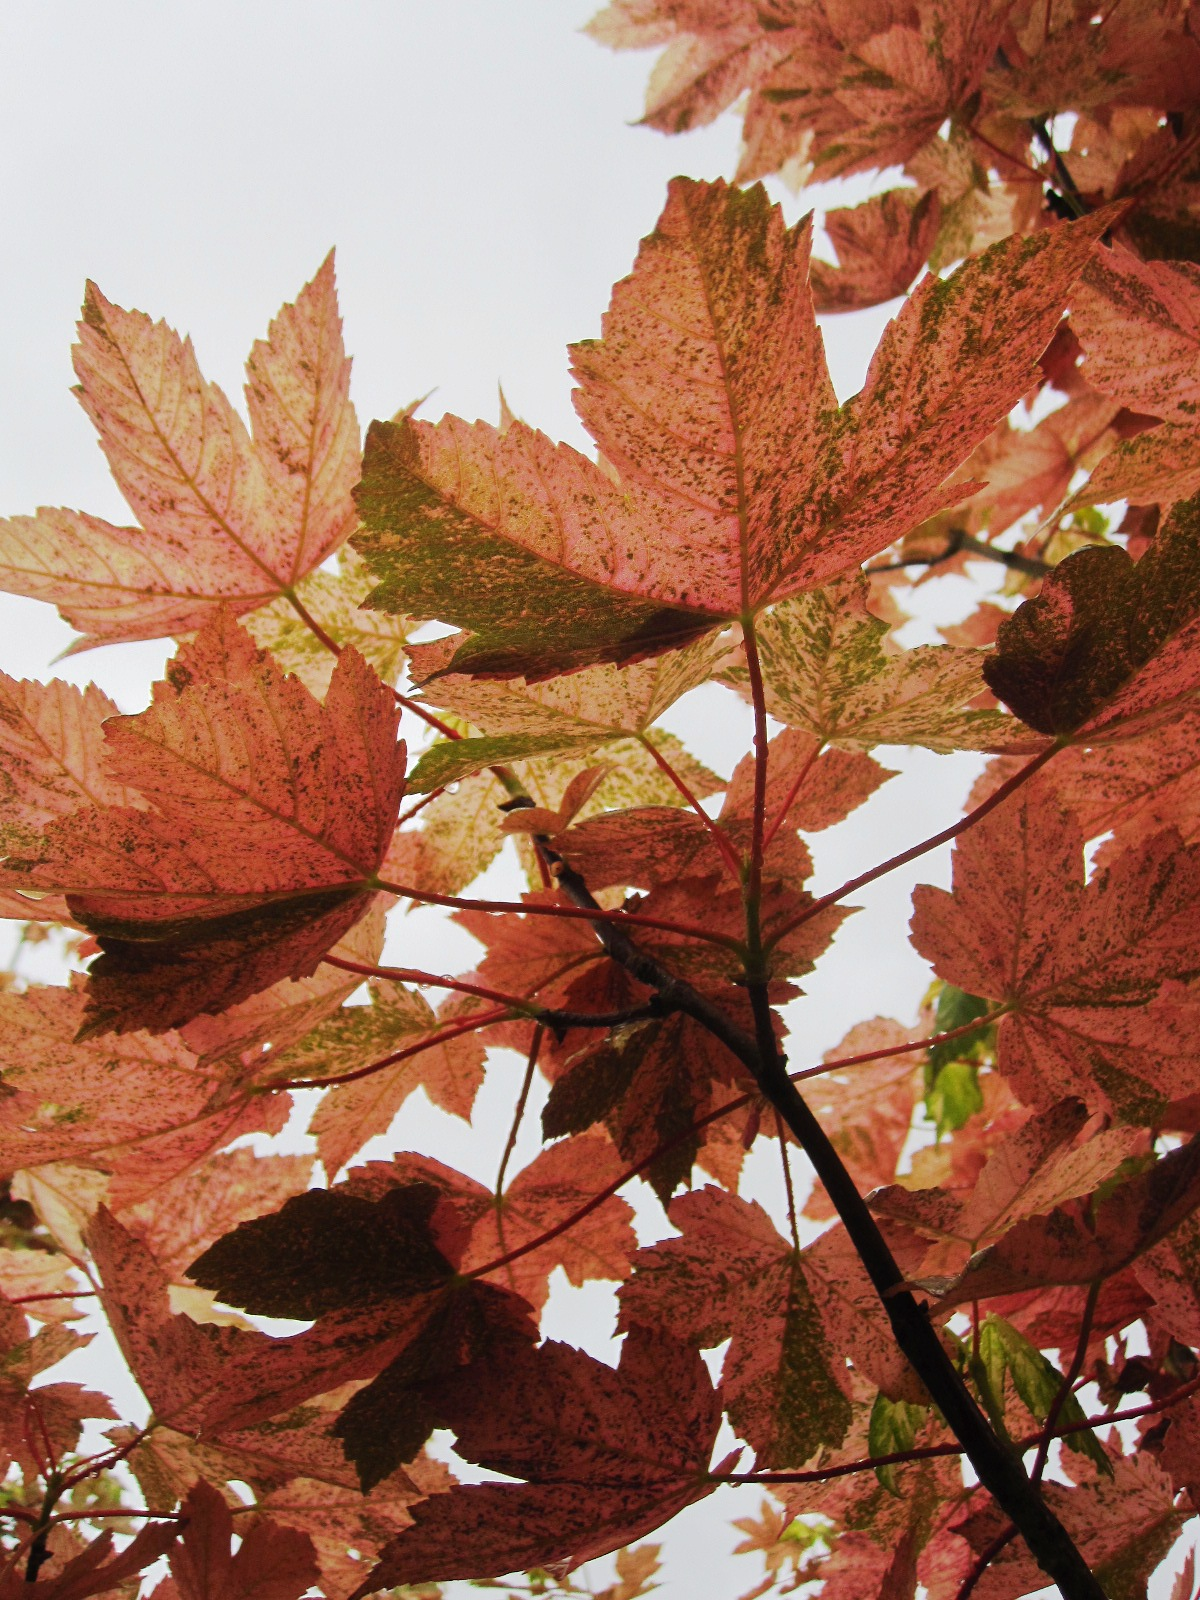 Acer pseu . 'Esk Sunset' leaf underside- will change to purple